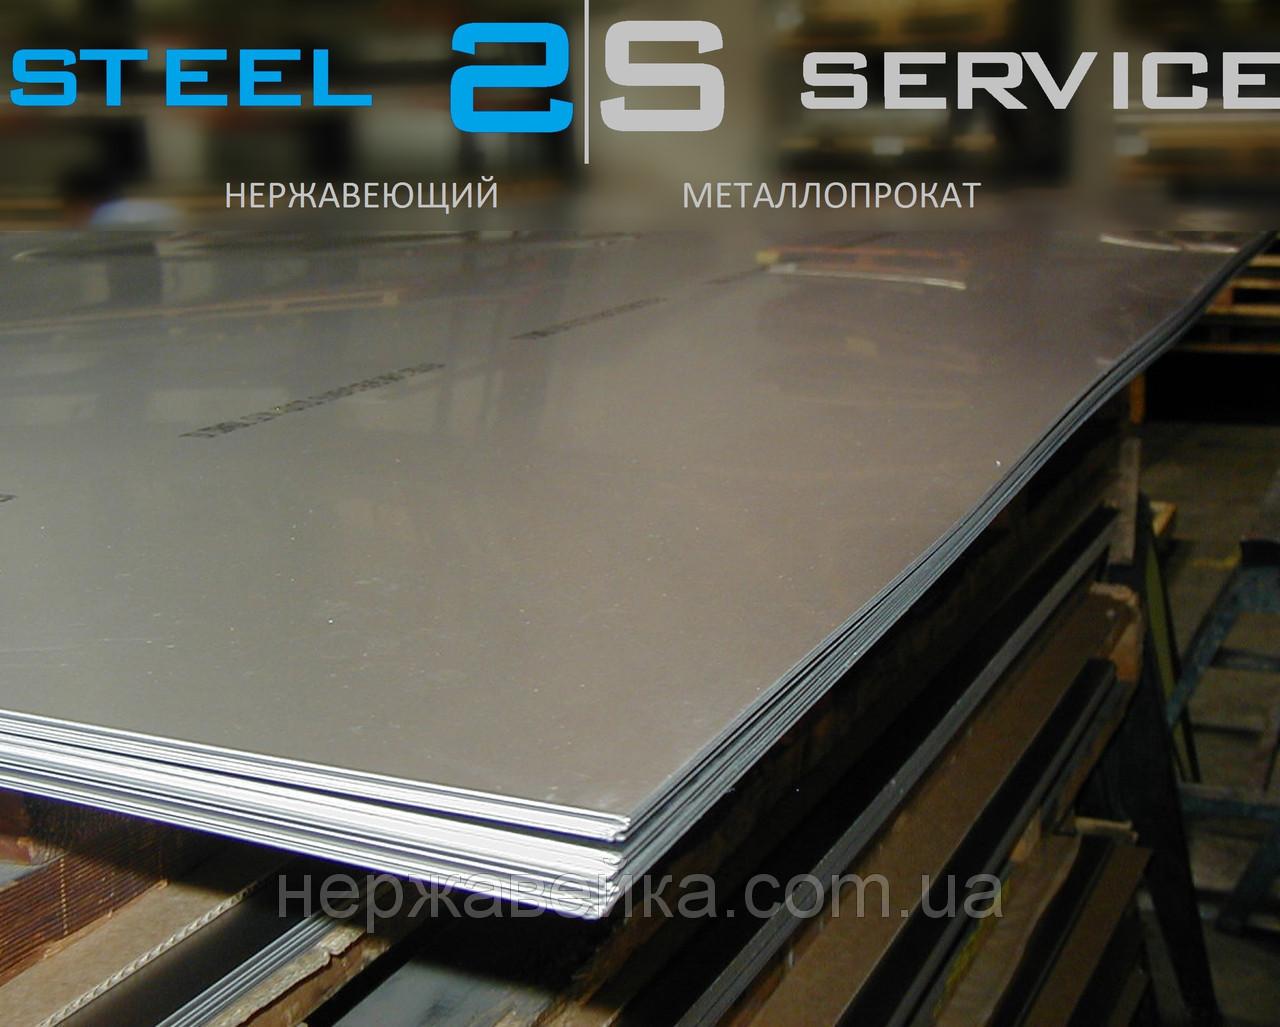 Листовая нержавейка 12х1250х2500мм AISI 430(12Х17) 2B - матовый, технический